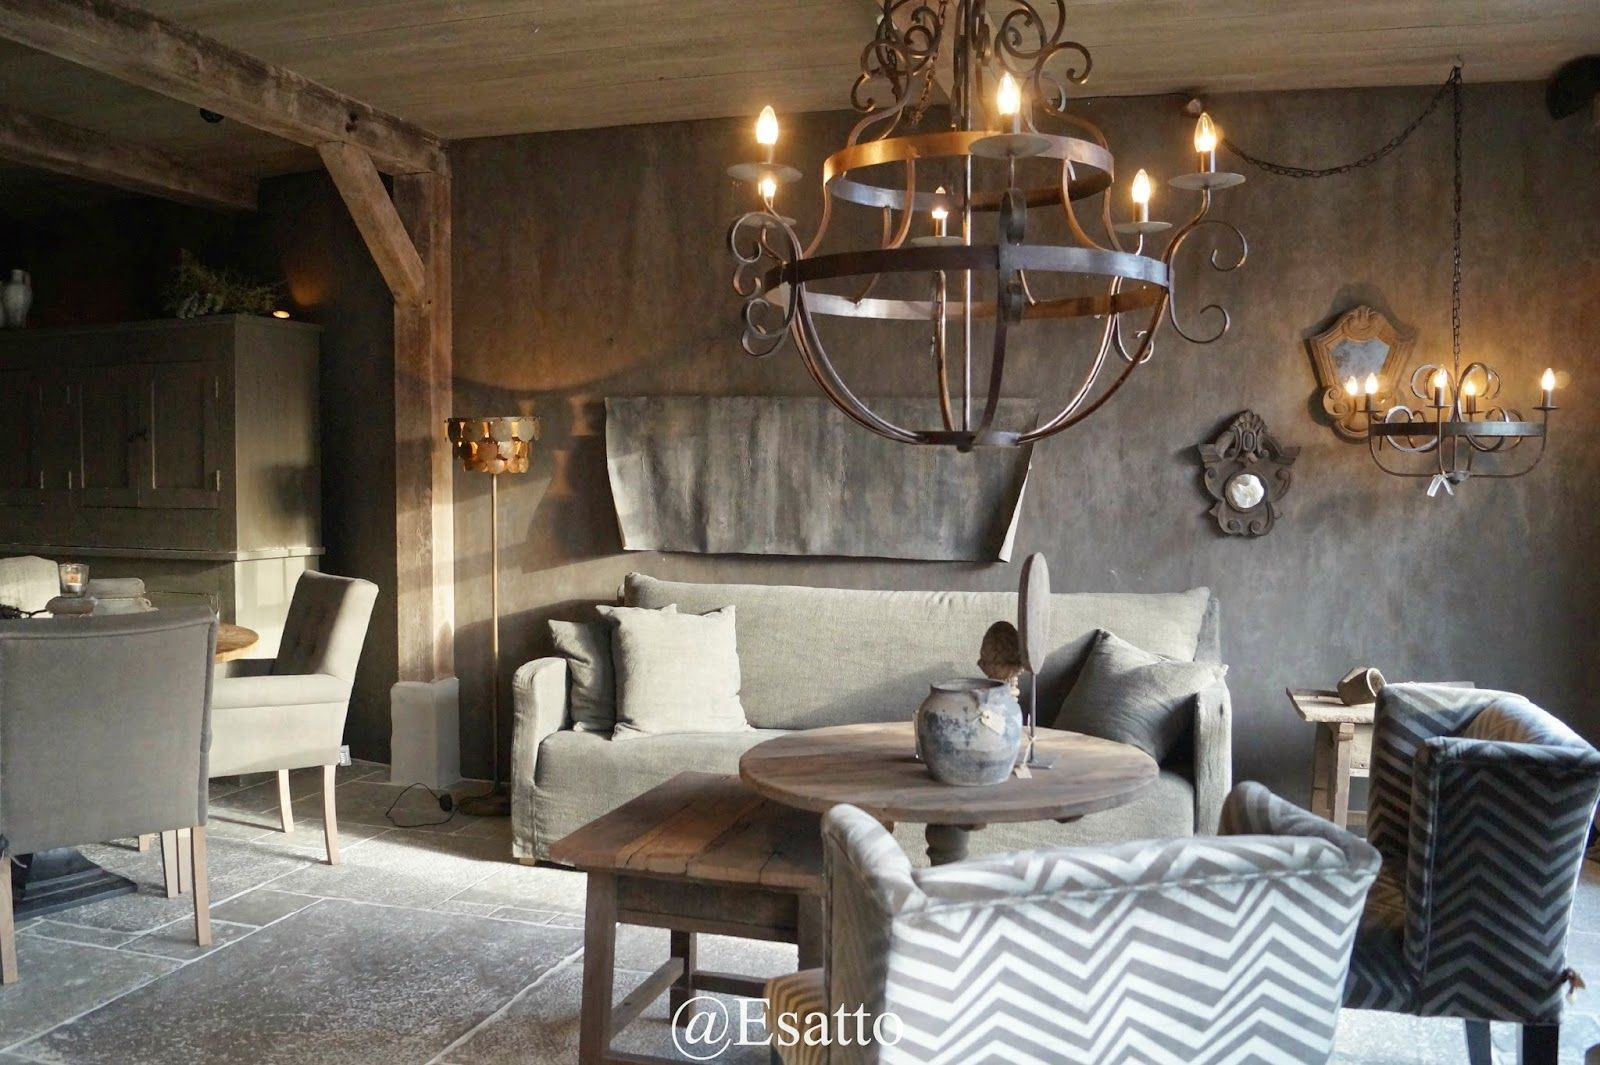 landelijke woonkamer | Pillow talk | Pinterest - Verlichting ...